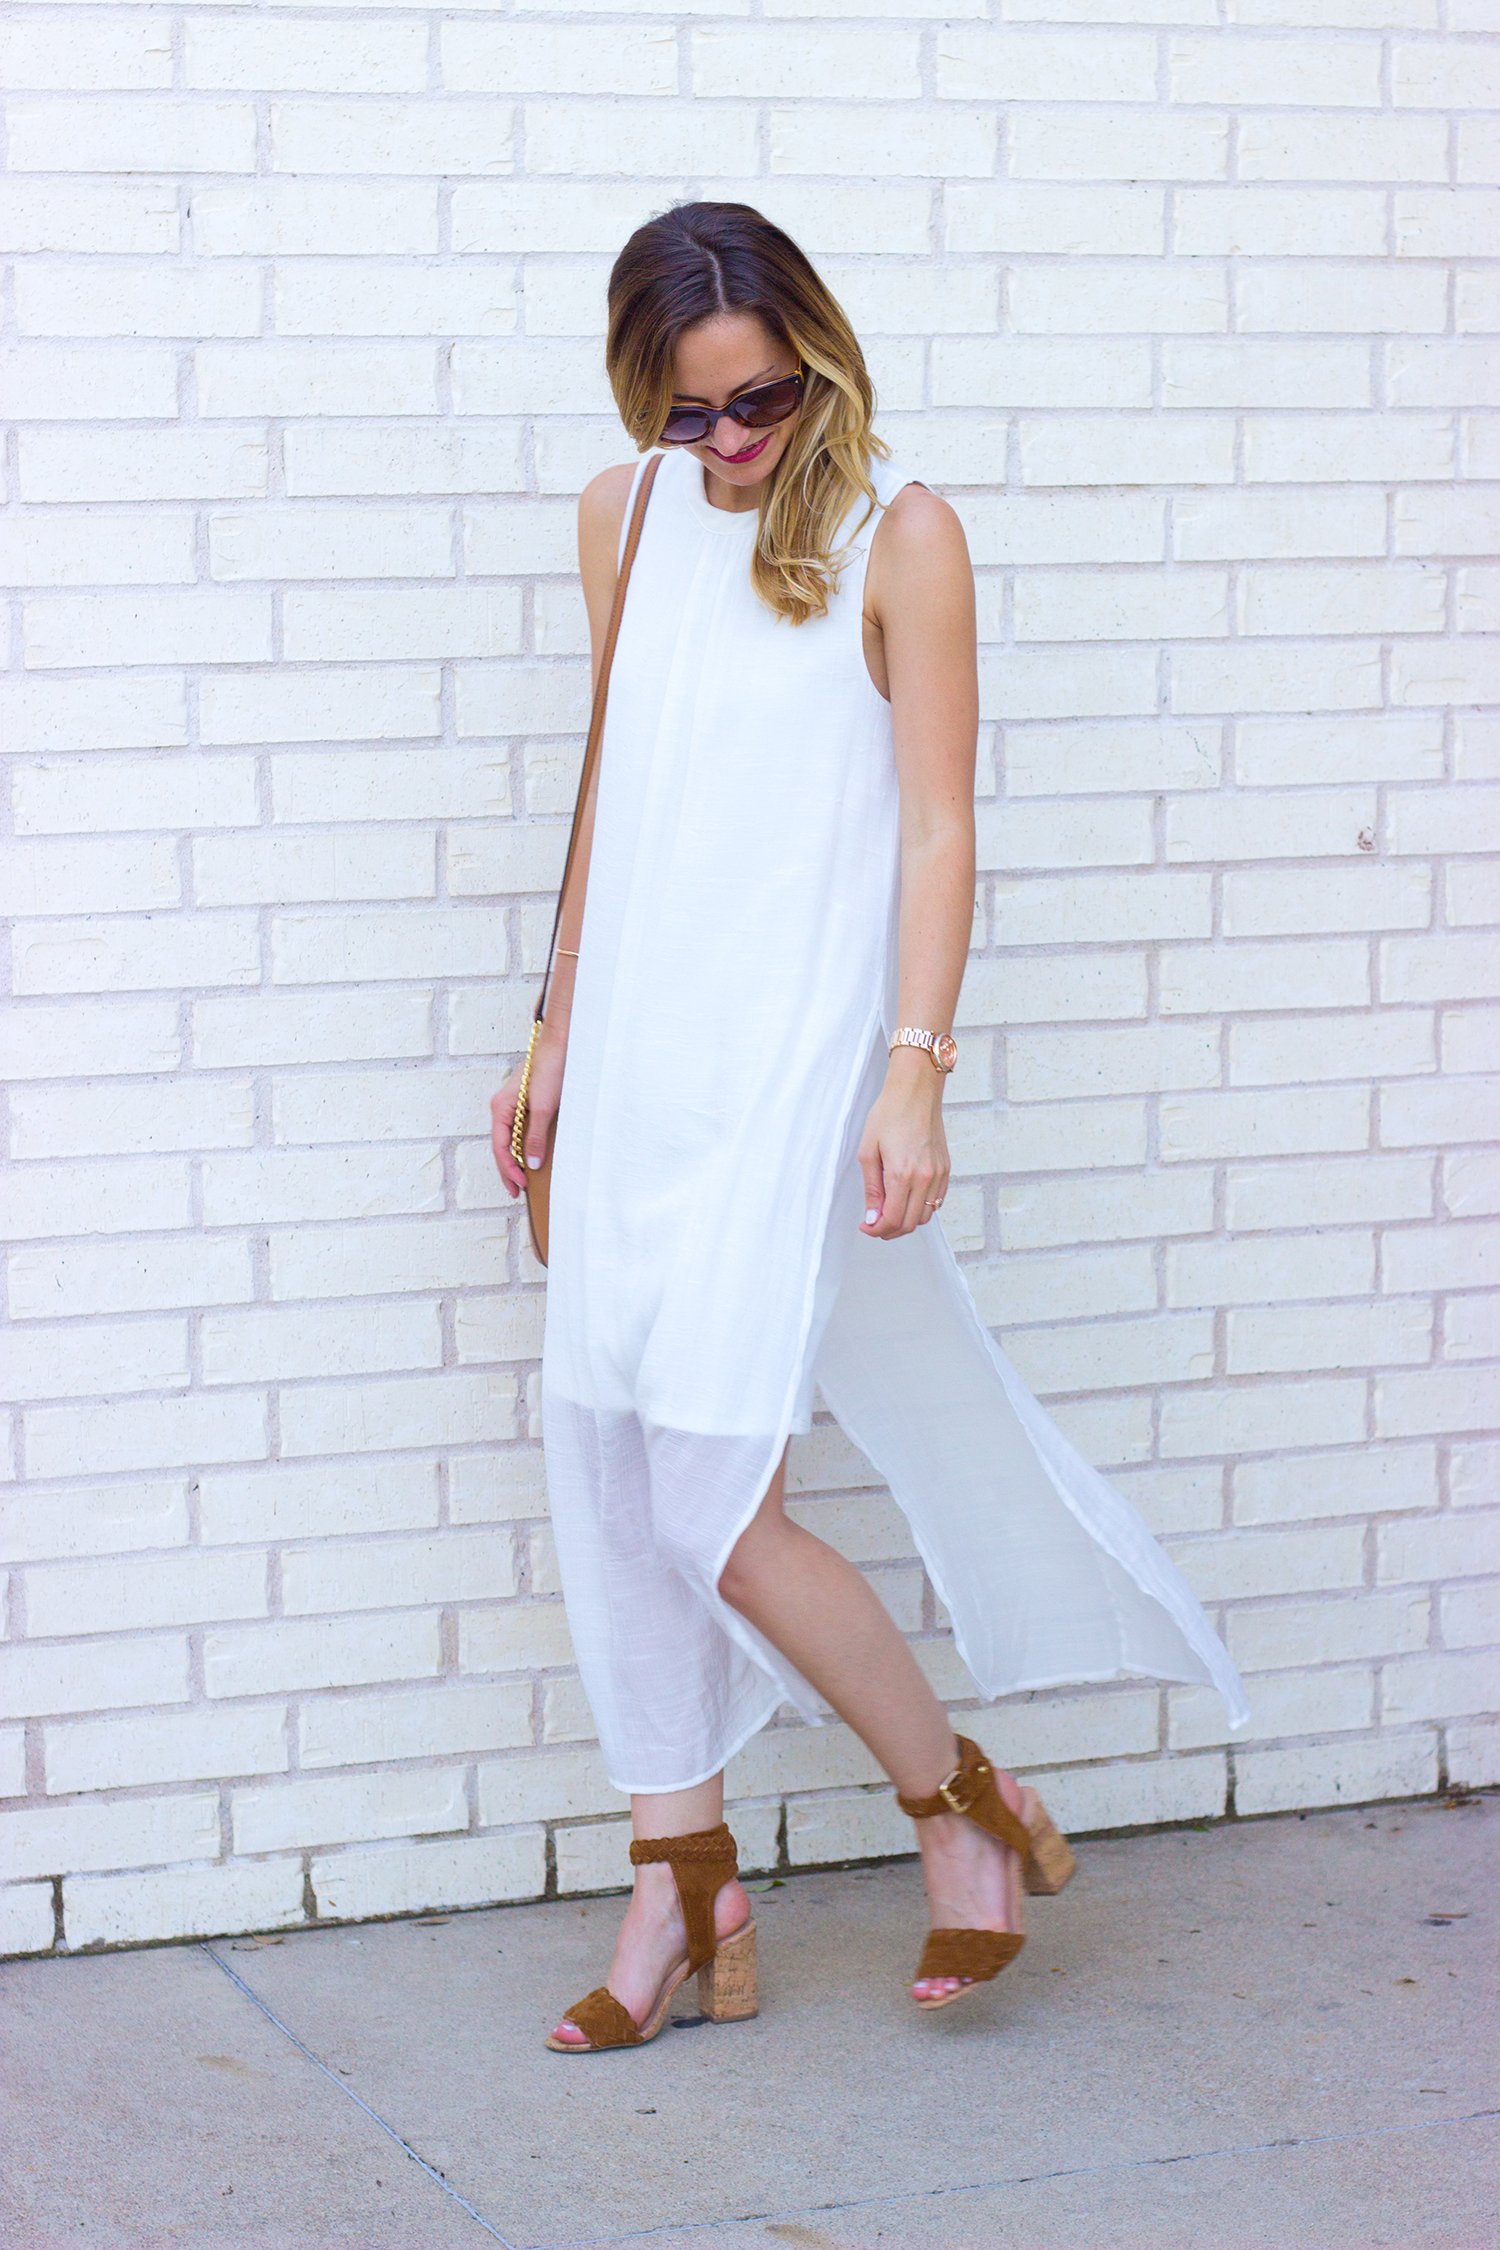 livvyland-blog-olivia-watson-white-sheer-midi-dress-painted-threads-braided-sandal-heels-austin-texas-fashion-blogger-rose-gold-kendra-scott-prada-cateye-sunglasses-spring-outfit-2